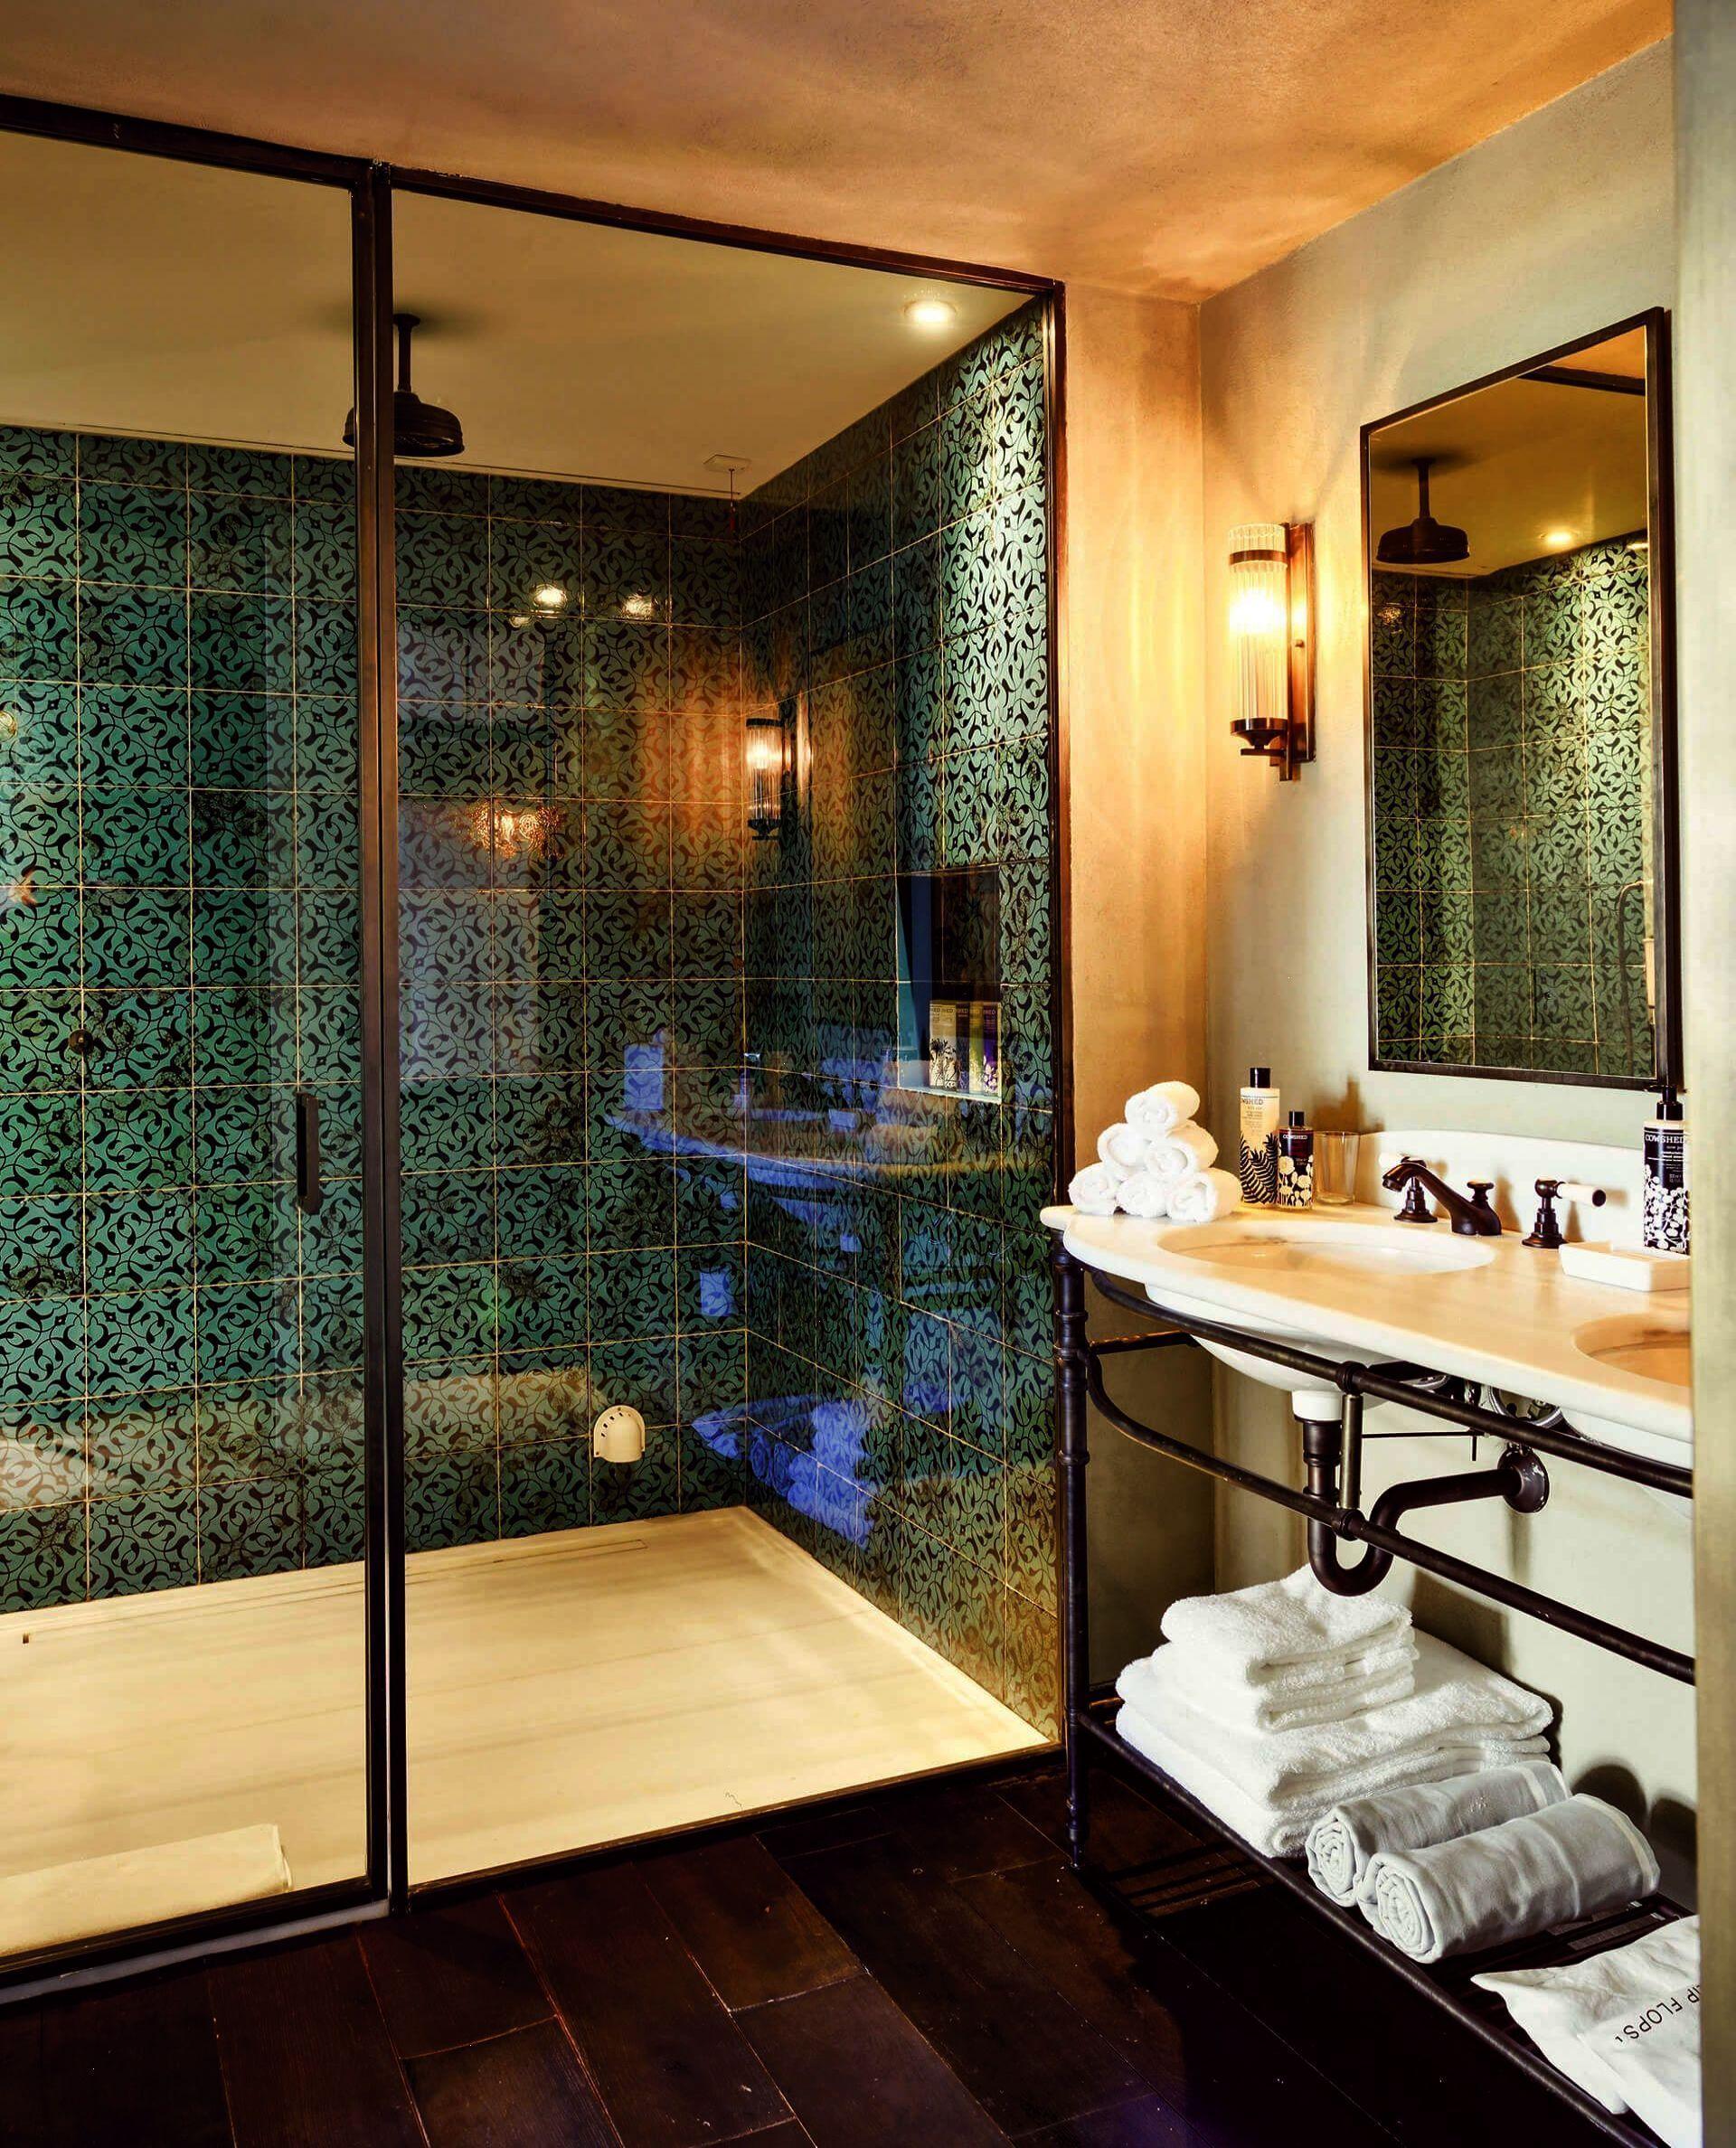 Bohemian Interior Design You Must Know - Design Rustic Scandinavian